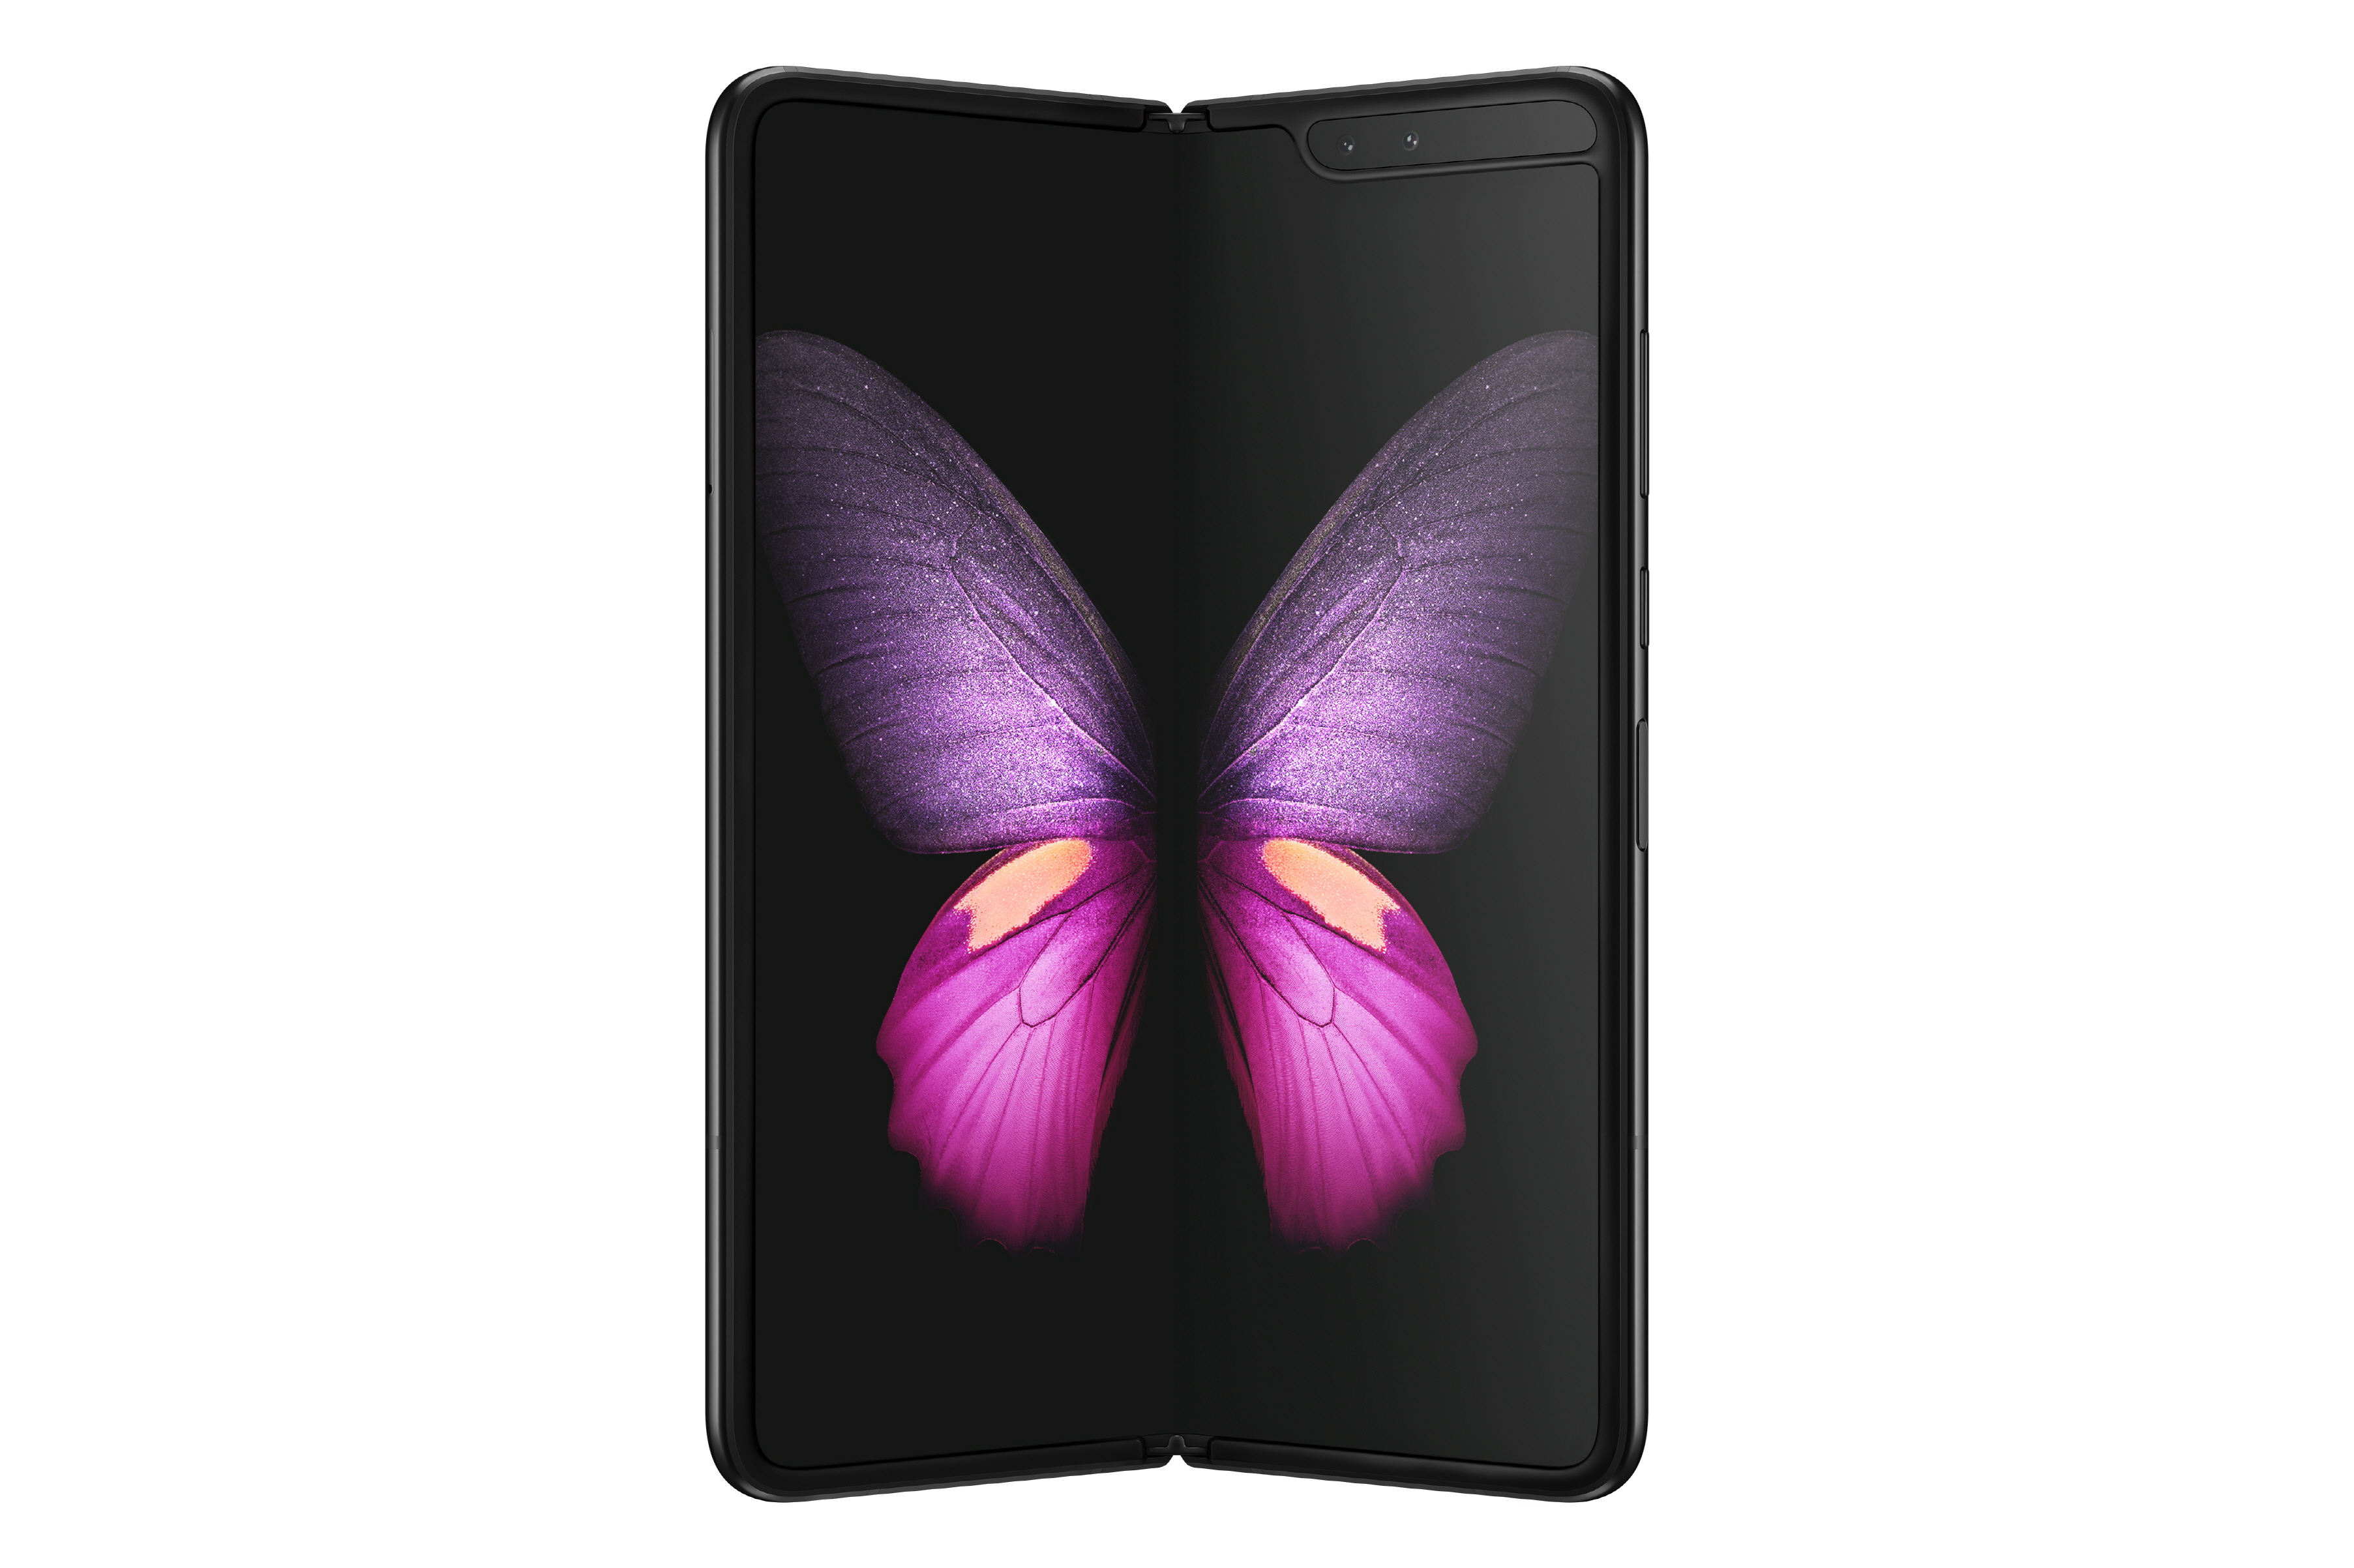 Samsung-Galaxy-Fold-Cosmos-Black-1-1